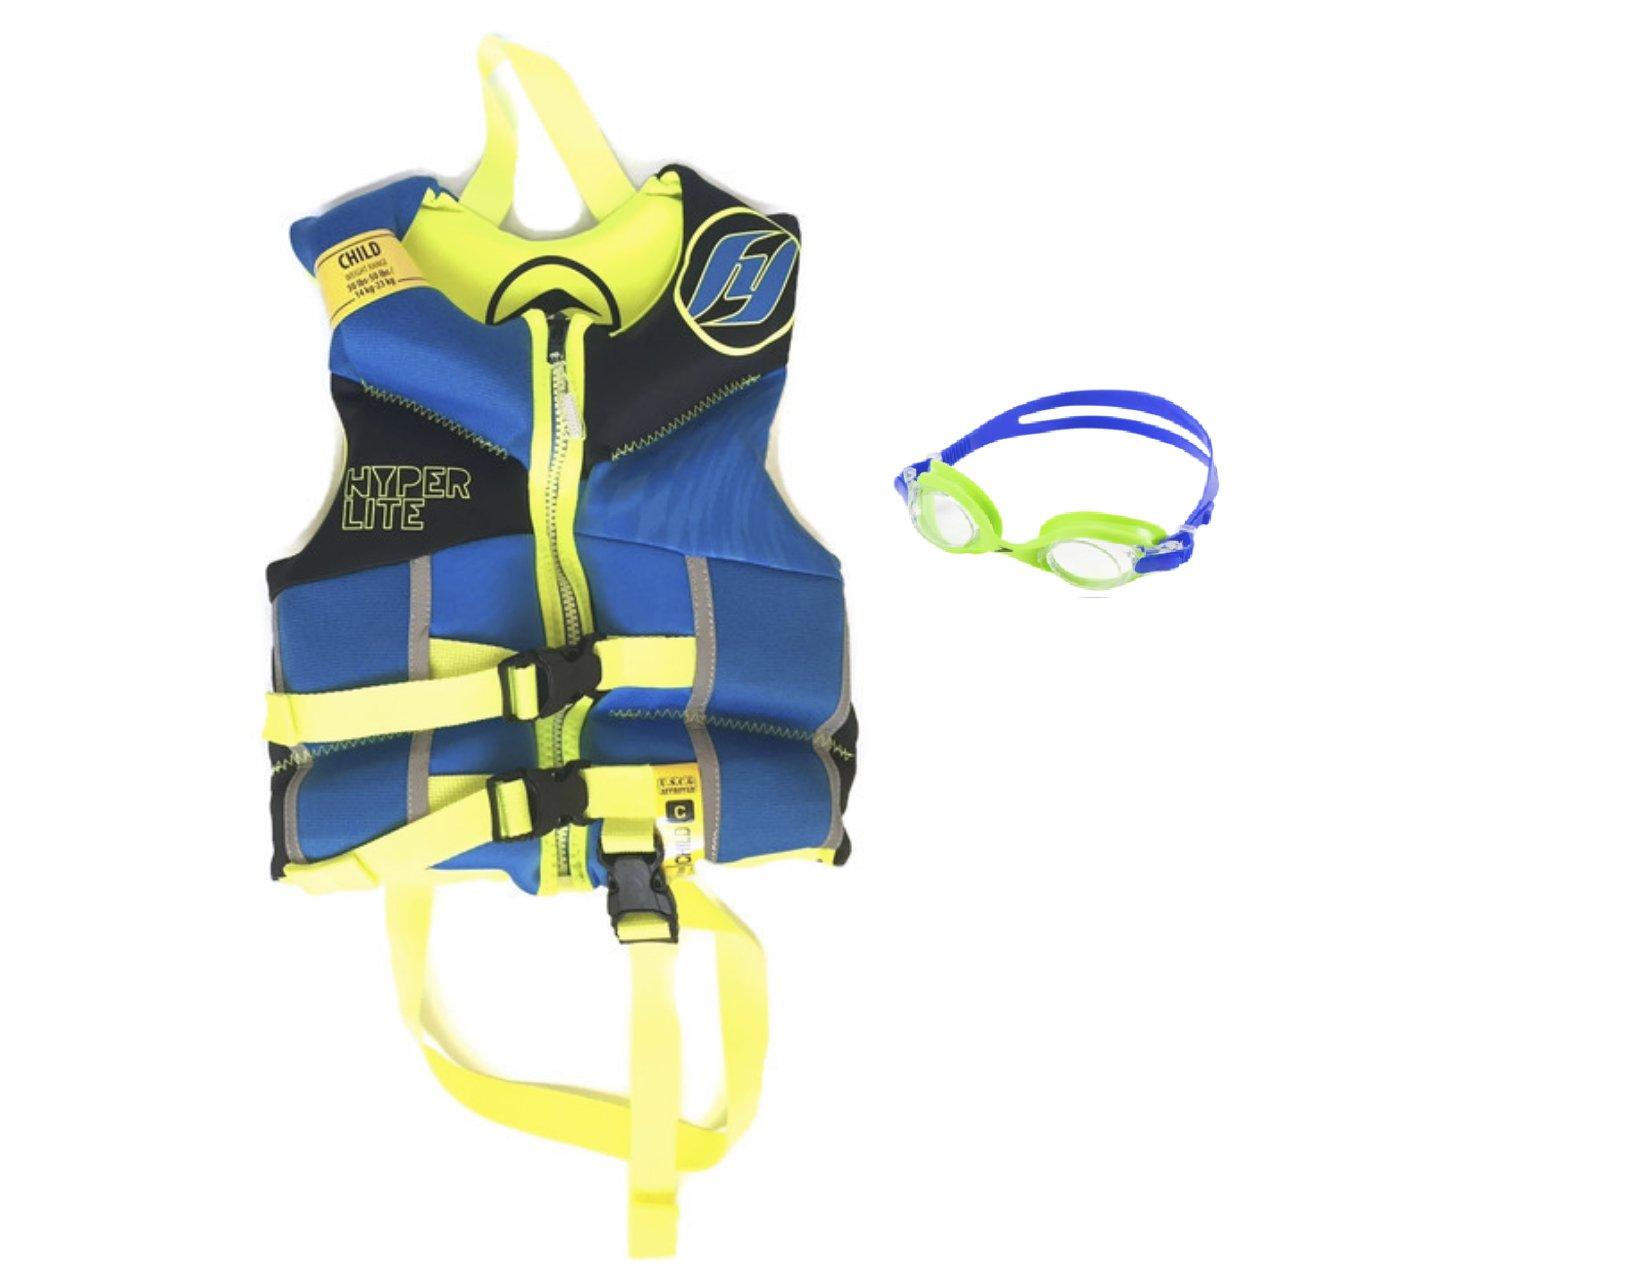 2016 Hyperlite Boys Boyz Kids Yellow Blue Child Life Vest Jacket Wakeboarding Fishing Boating Swimming- 30-45lbs + Bonus Speedo Goggles